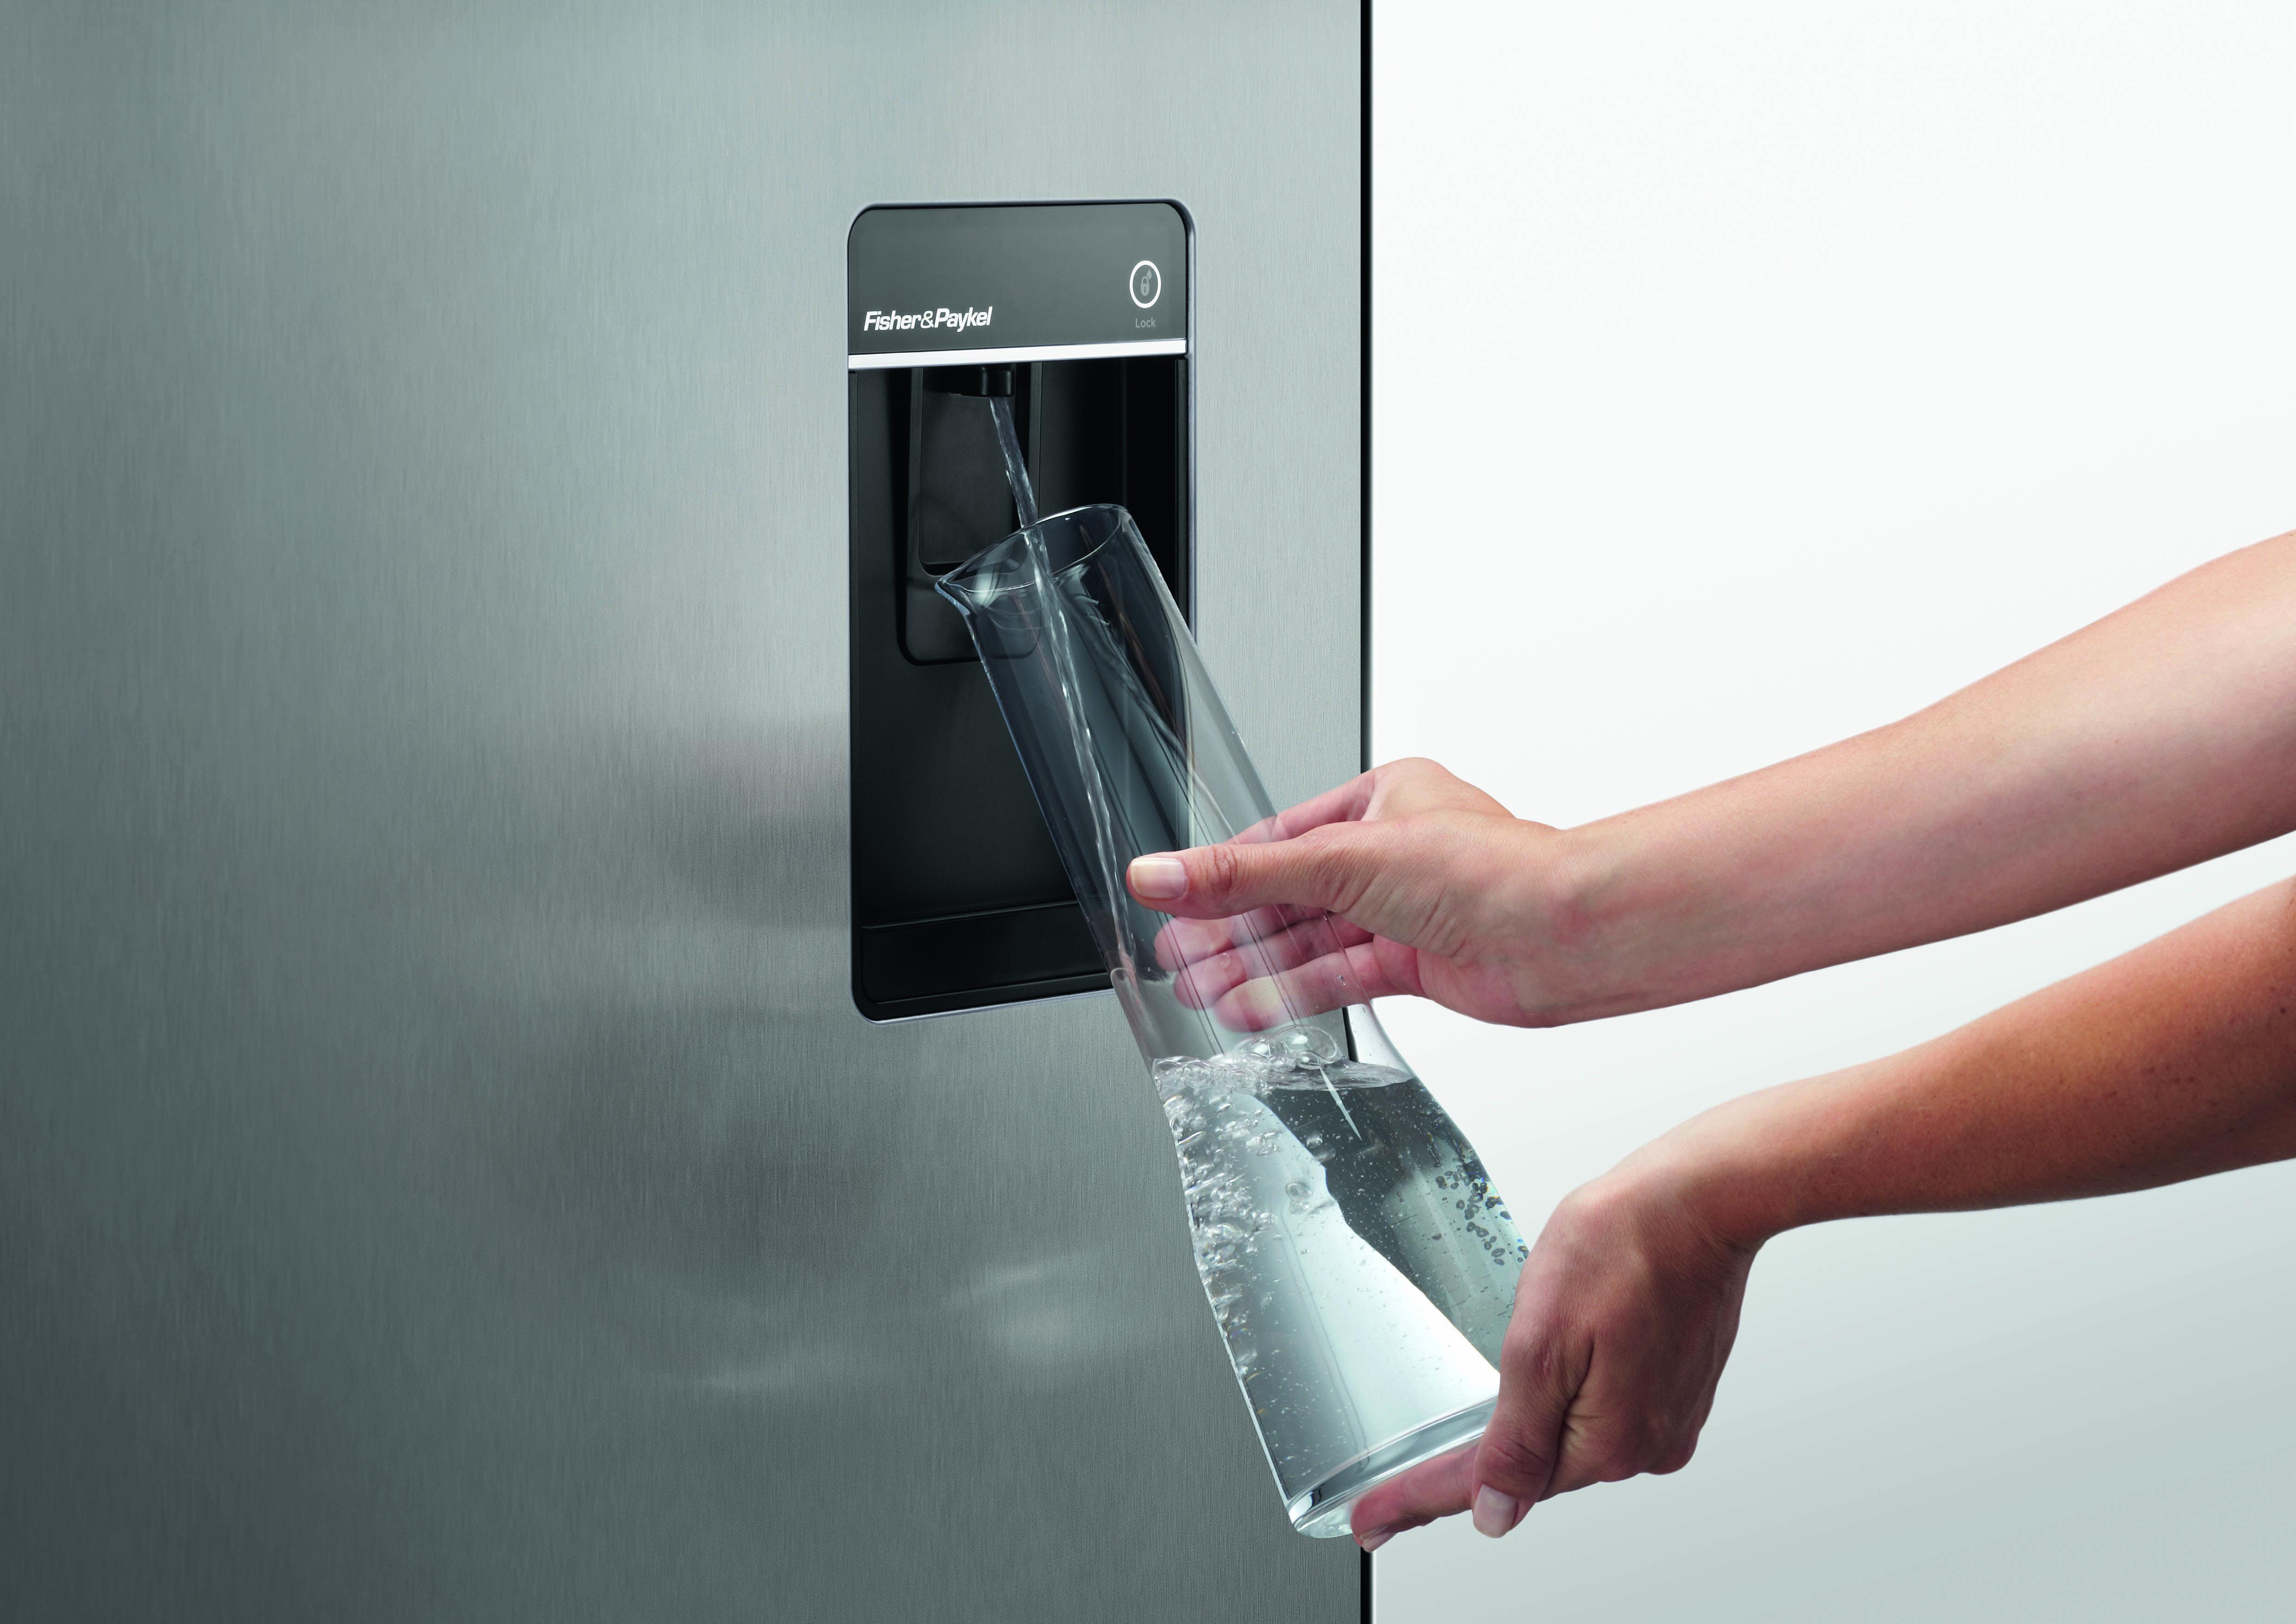 Auto Sensor Soap Sanitizer Liquid Dispensers Lotion Wall Mounted